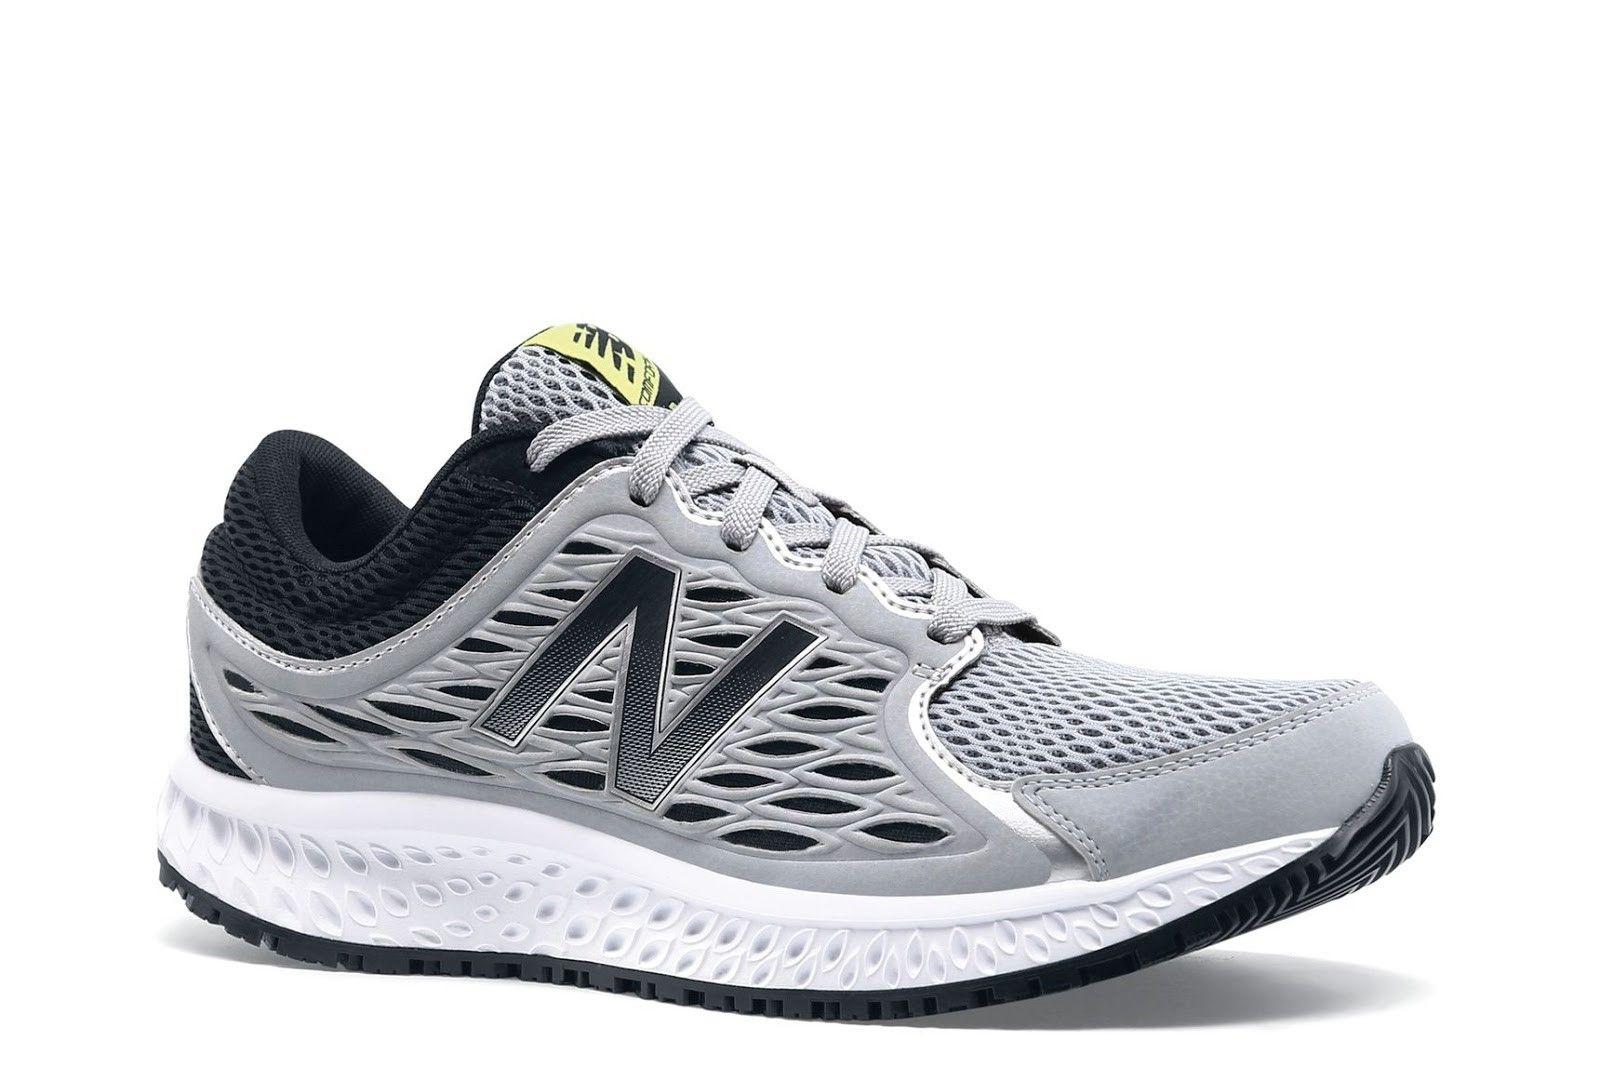 New Balance 420 v3 - Gray / Silver